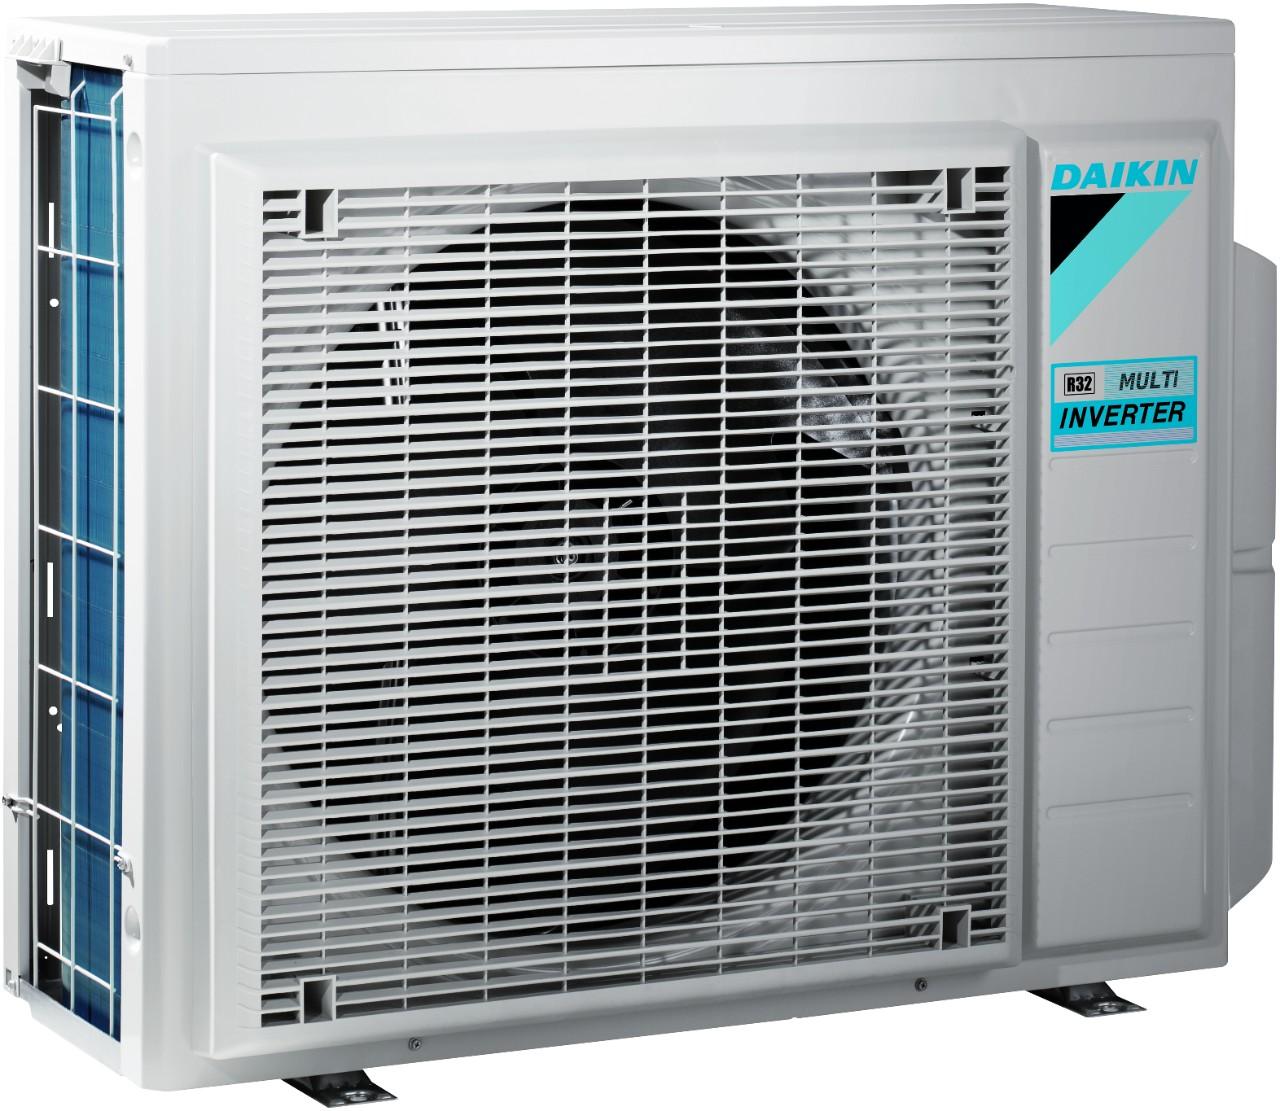 Climatiseur DAIKIN multi réversible inverser 5MXM90M.